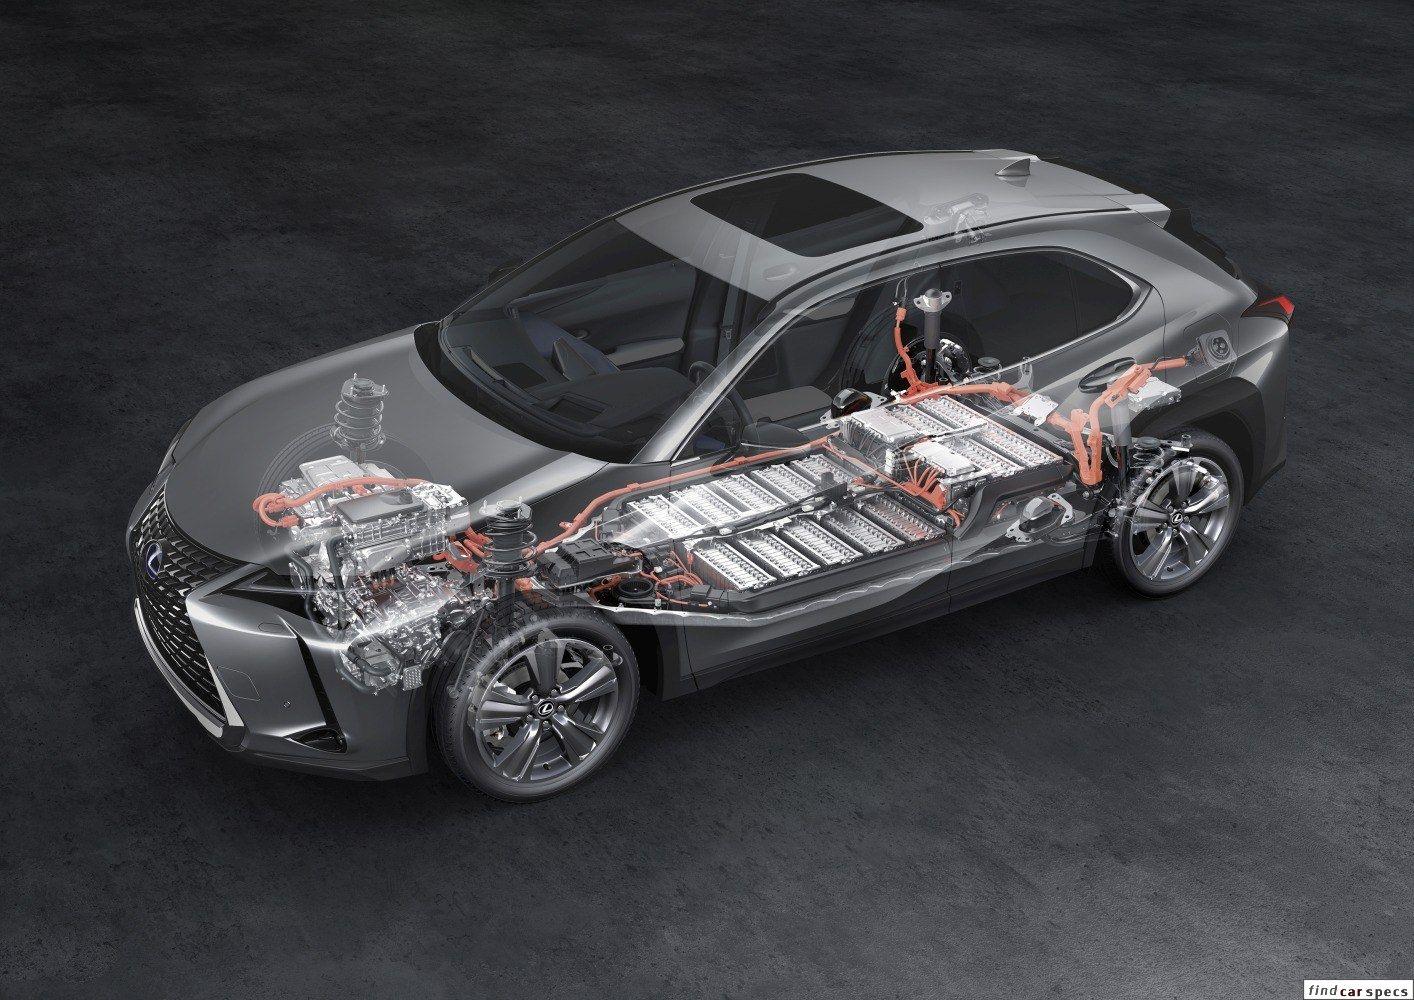 Lexus Ux Ux Ev 300e 54 3 Kwh 204 Hp Electric Electricity 2020 Ux Ev 300e 54 3 Kwh 204 Hp Electric E In 2020 Lexus Models Tyre Size Fuel Economy